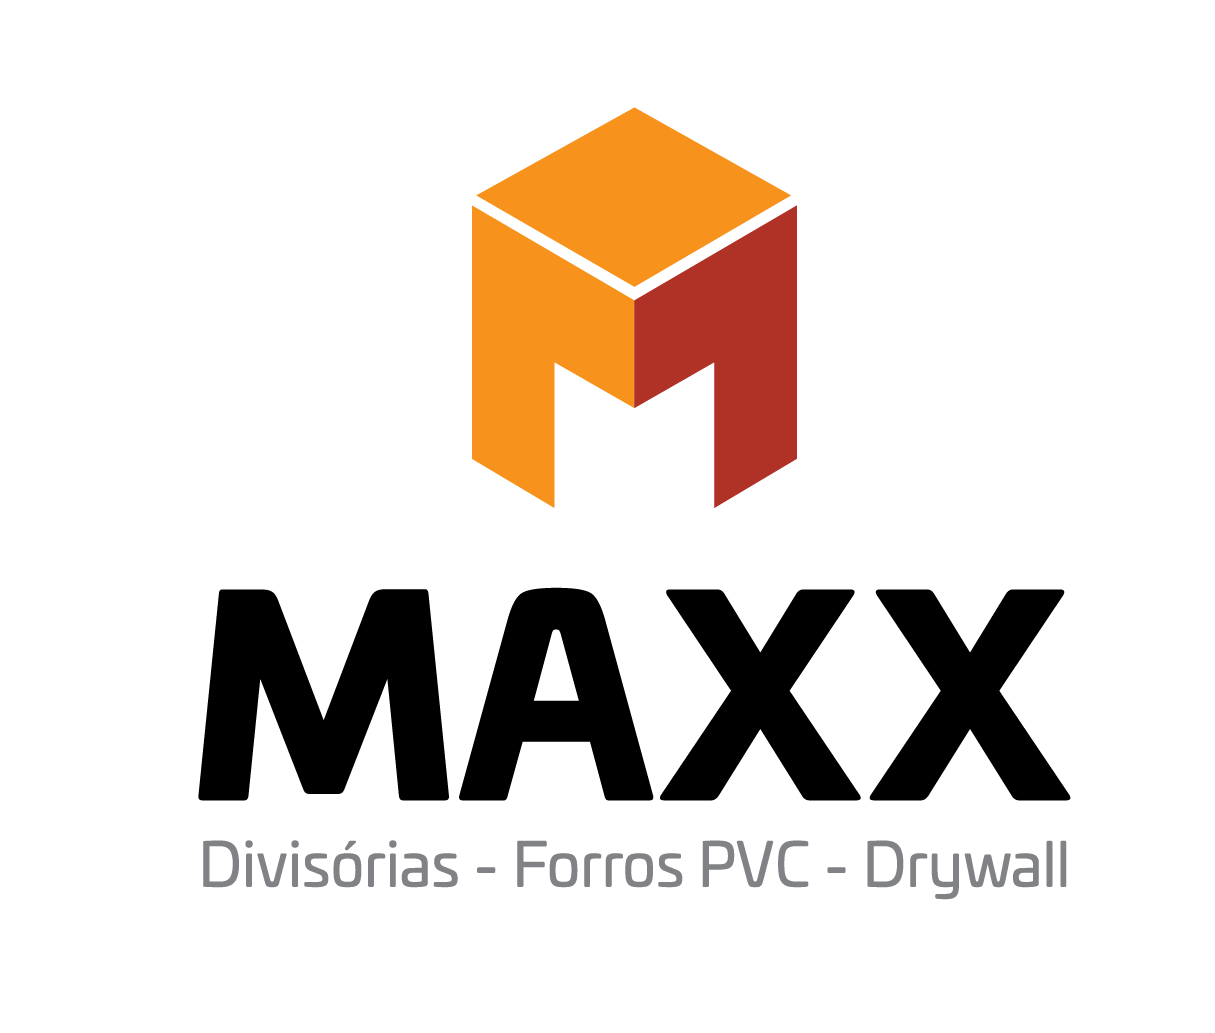 forro de gesso acartonado com sanca - Maxx Forro